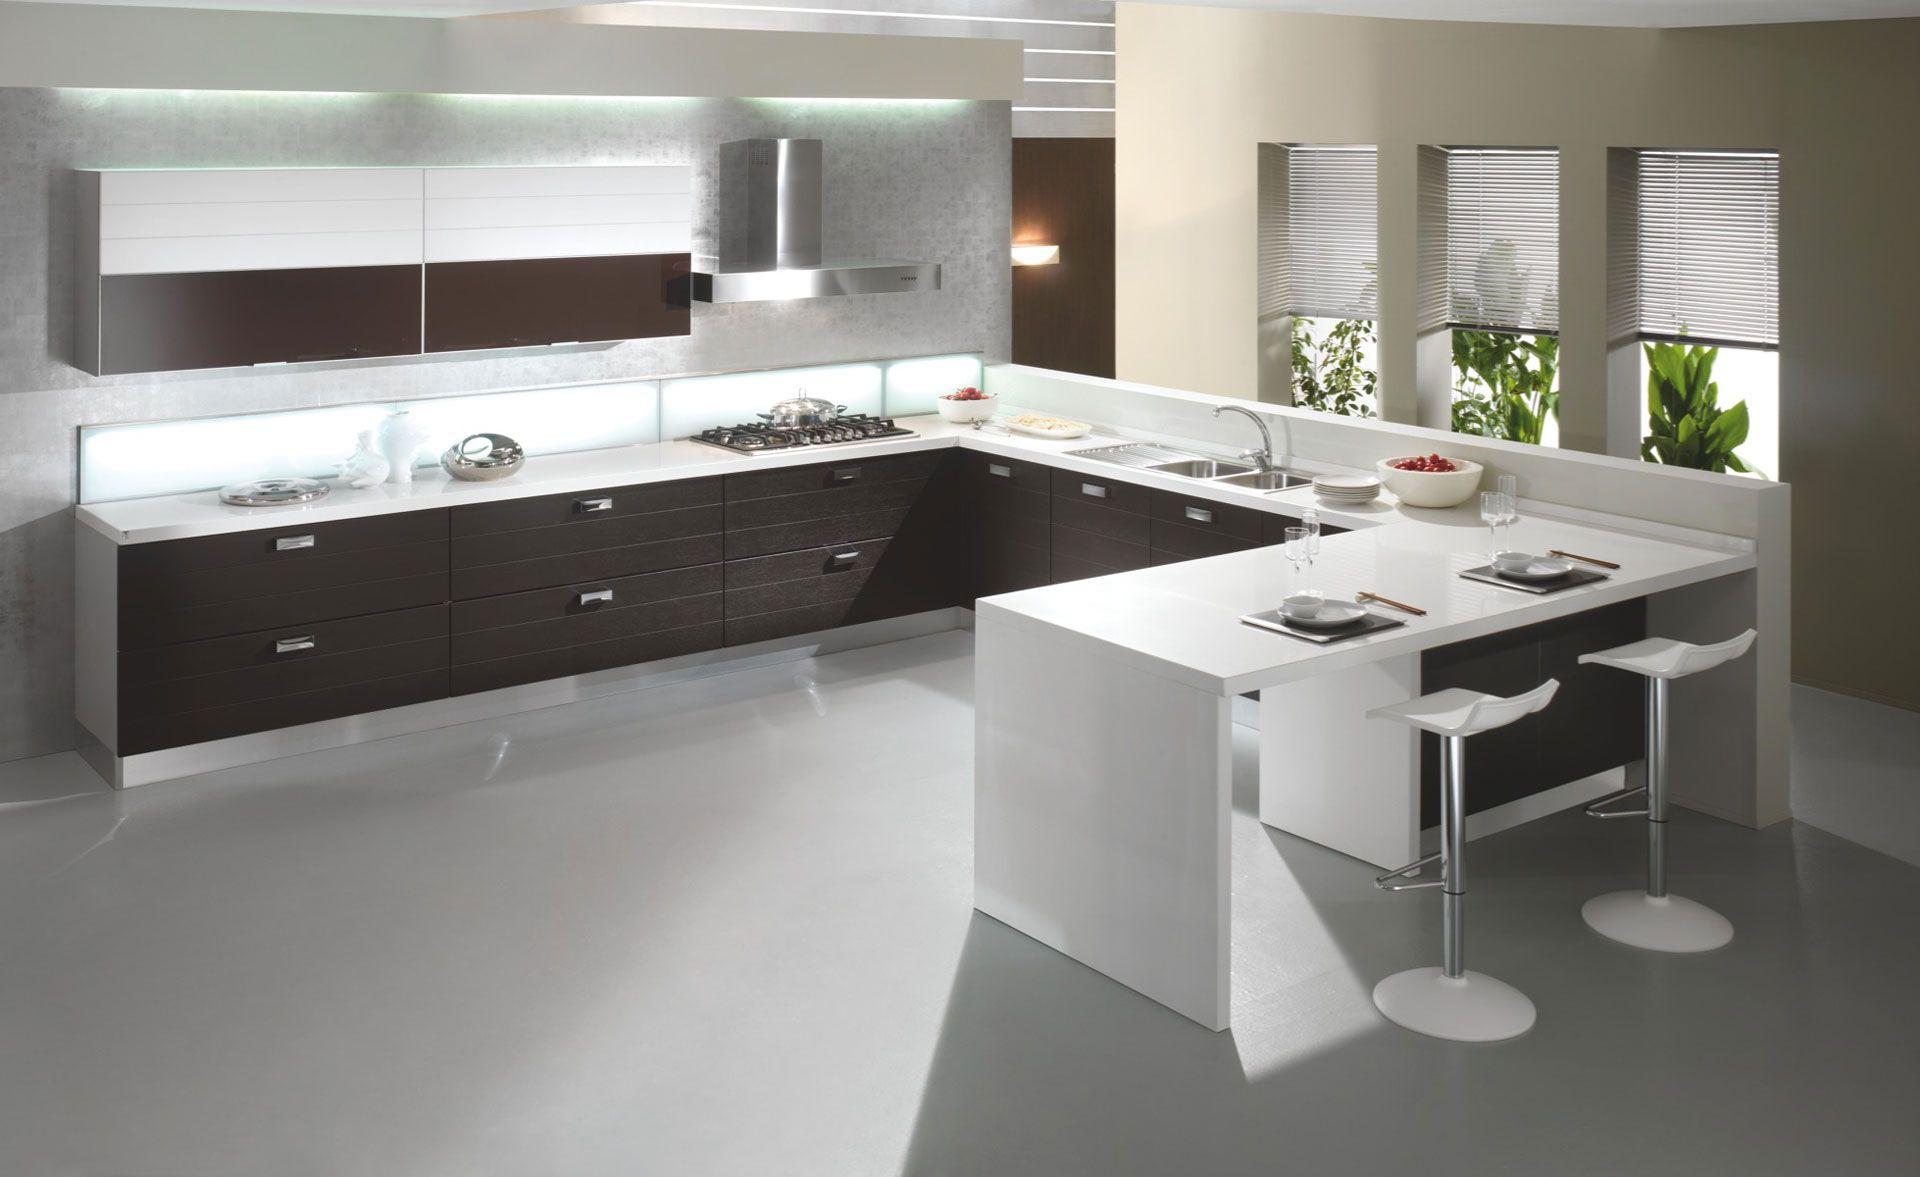 Concept Cucina Moderna Con Isola E Mobili Wenge Interior Design : Cucine moderne bianche e grigie va regardsdefemmes